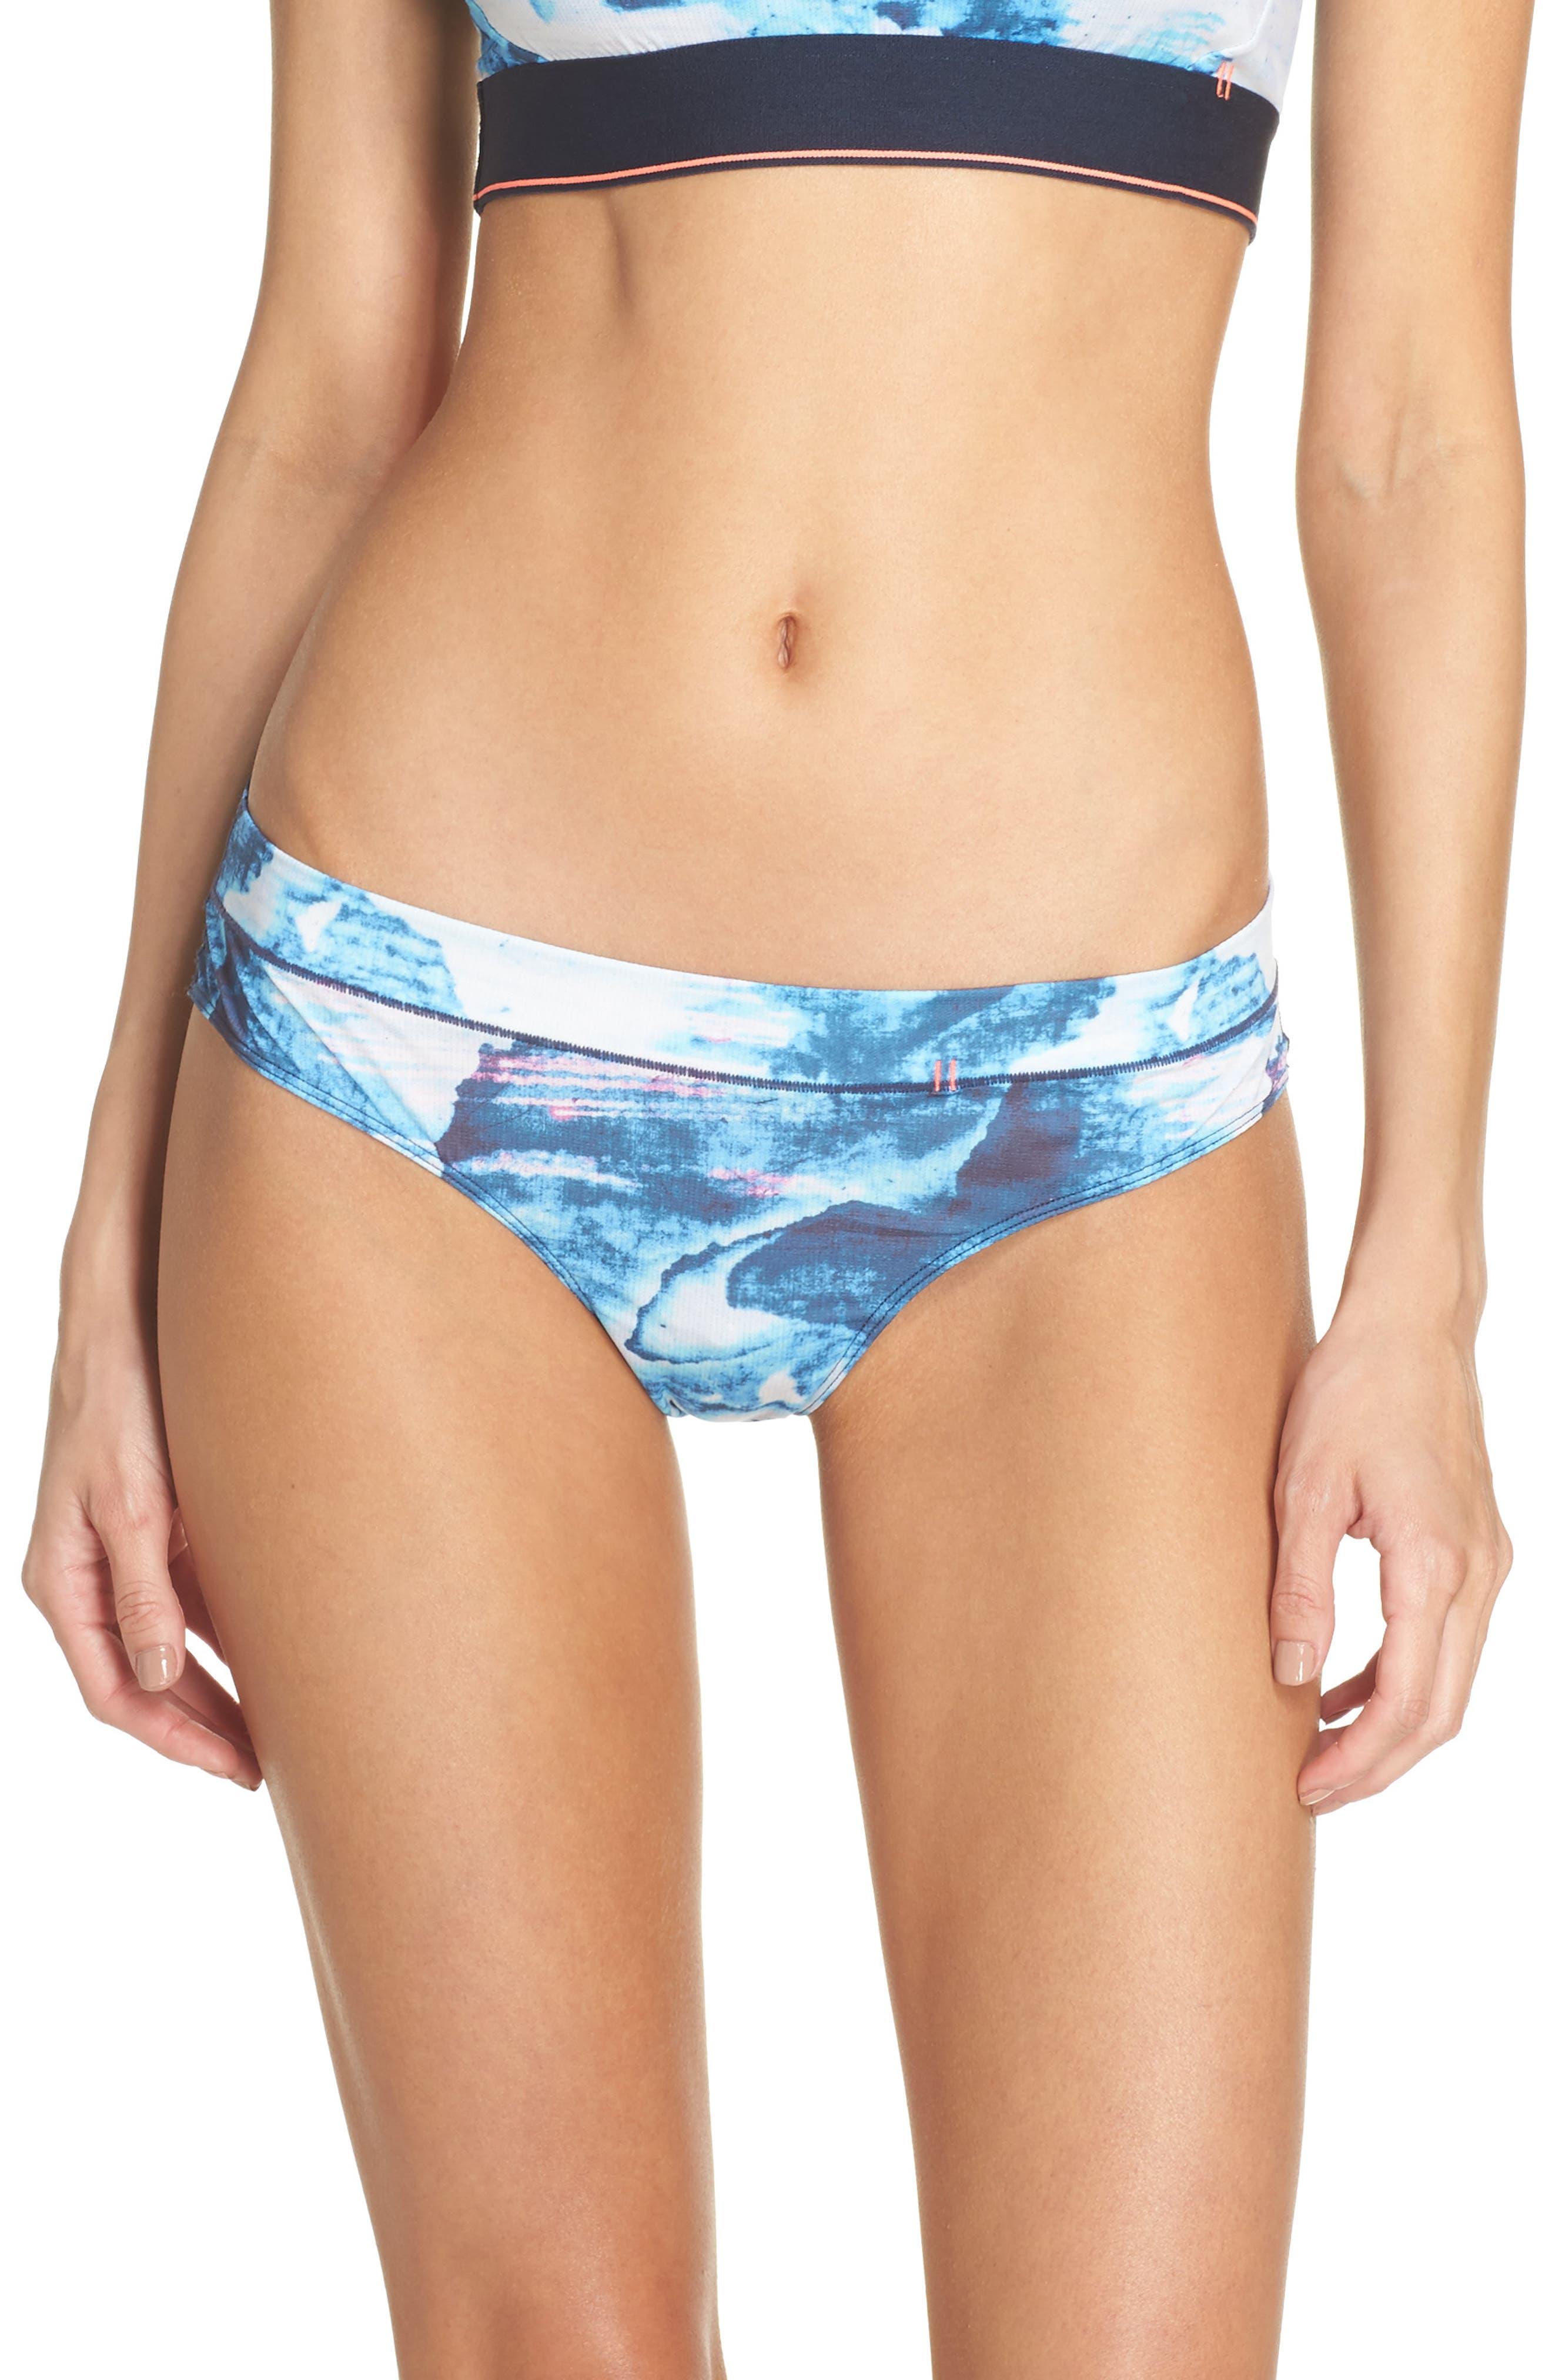 Tropic Storm Cheeky Bikini,                         Main,                         color, Navy